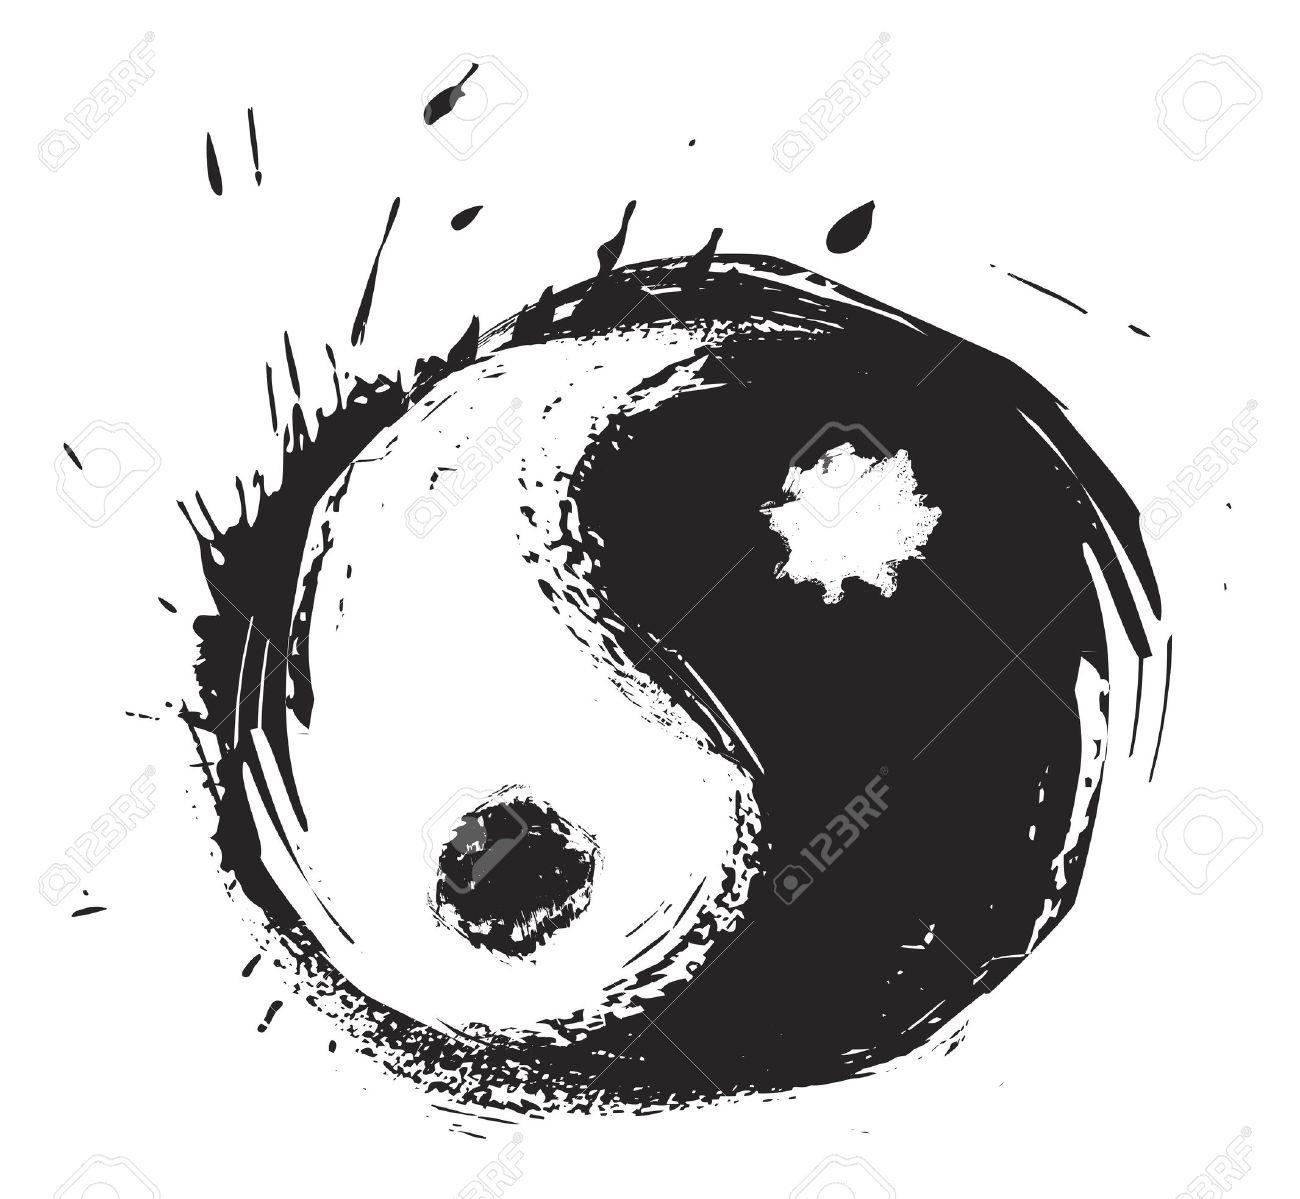 Artistic yin-yang symbol Stock Vector - 6663423